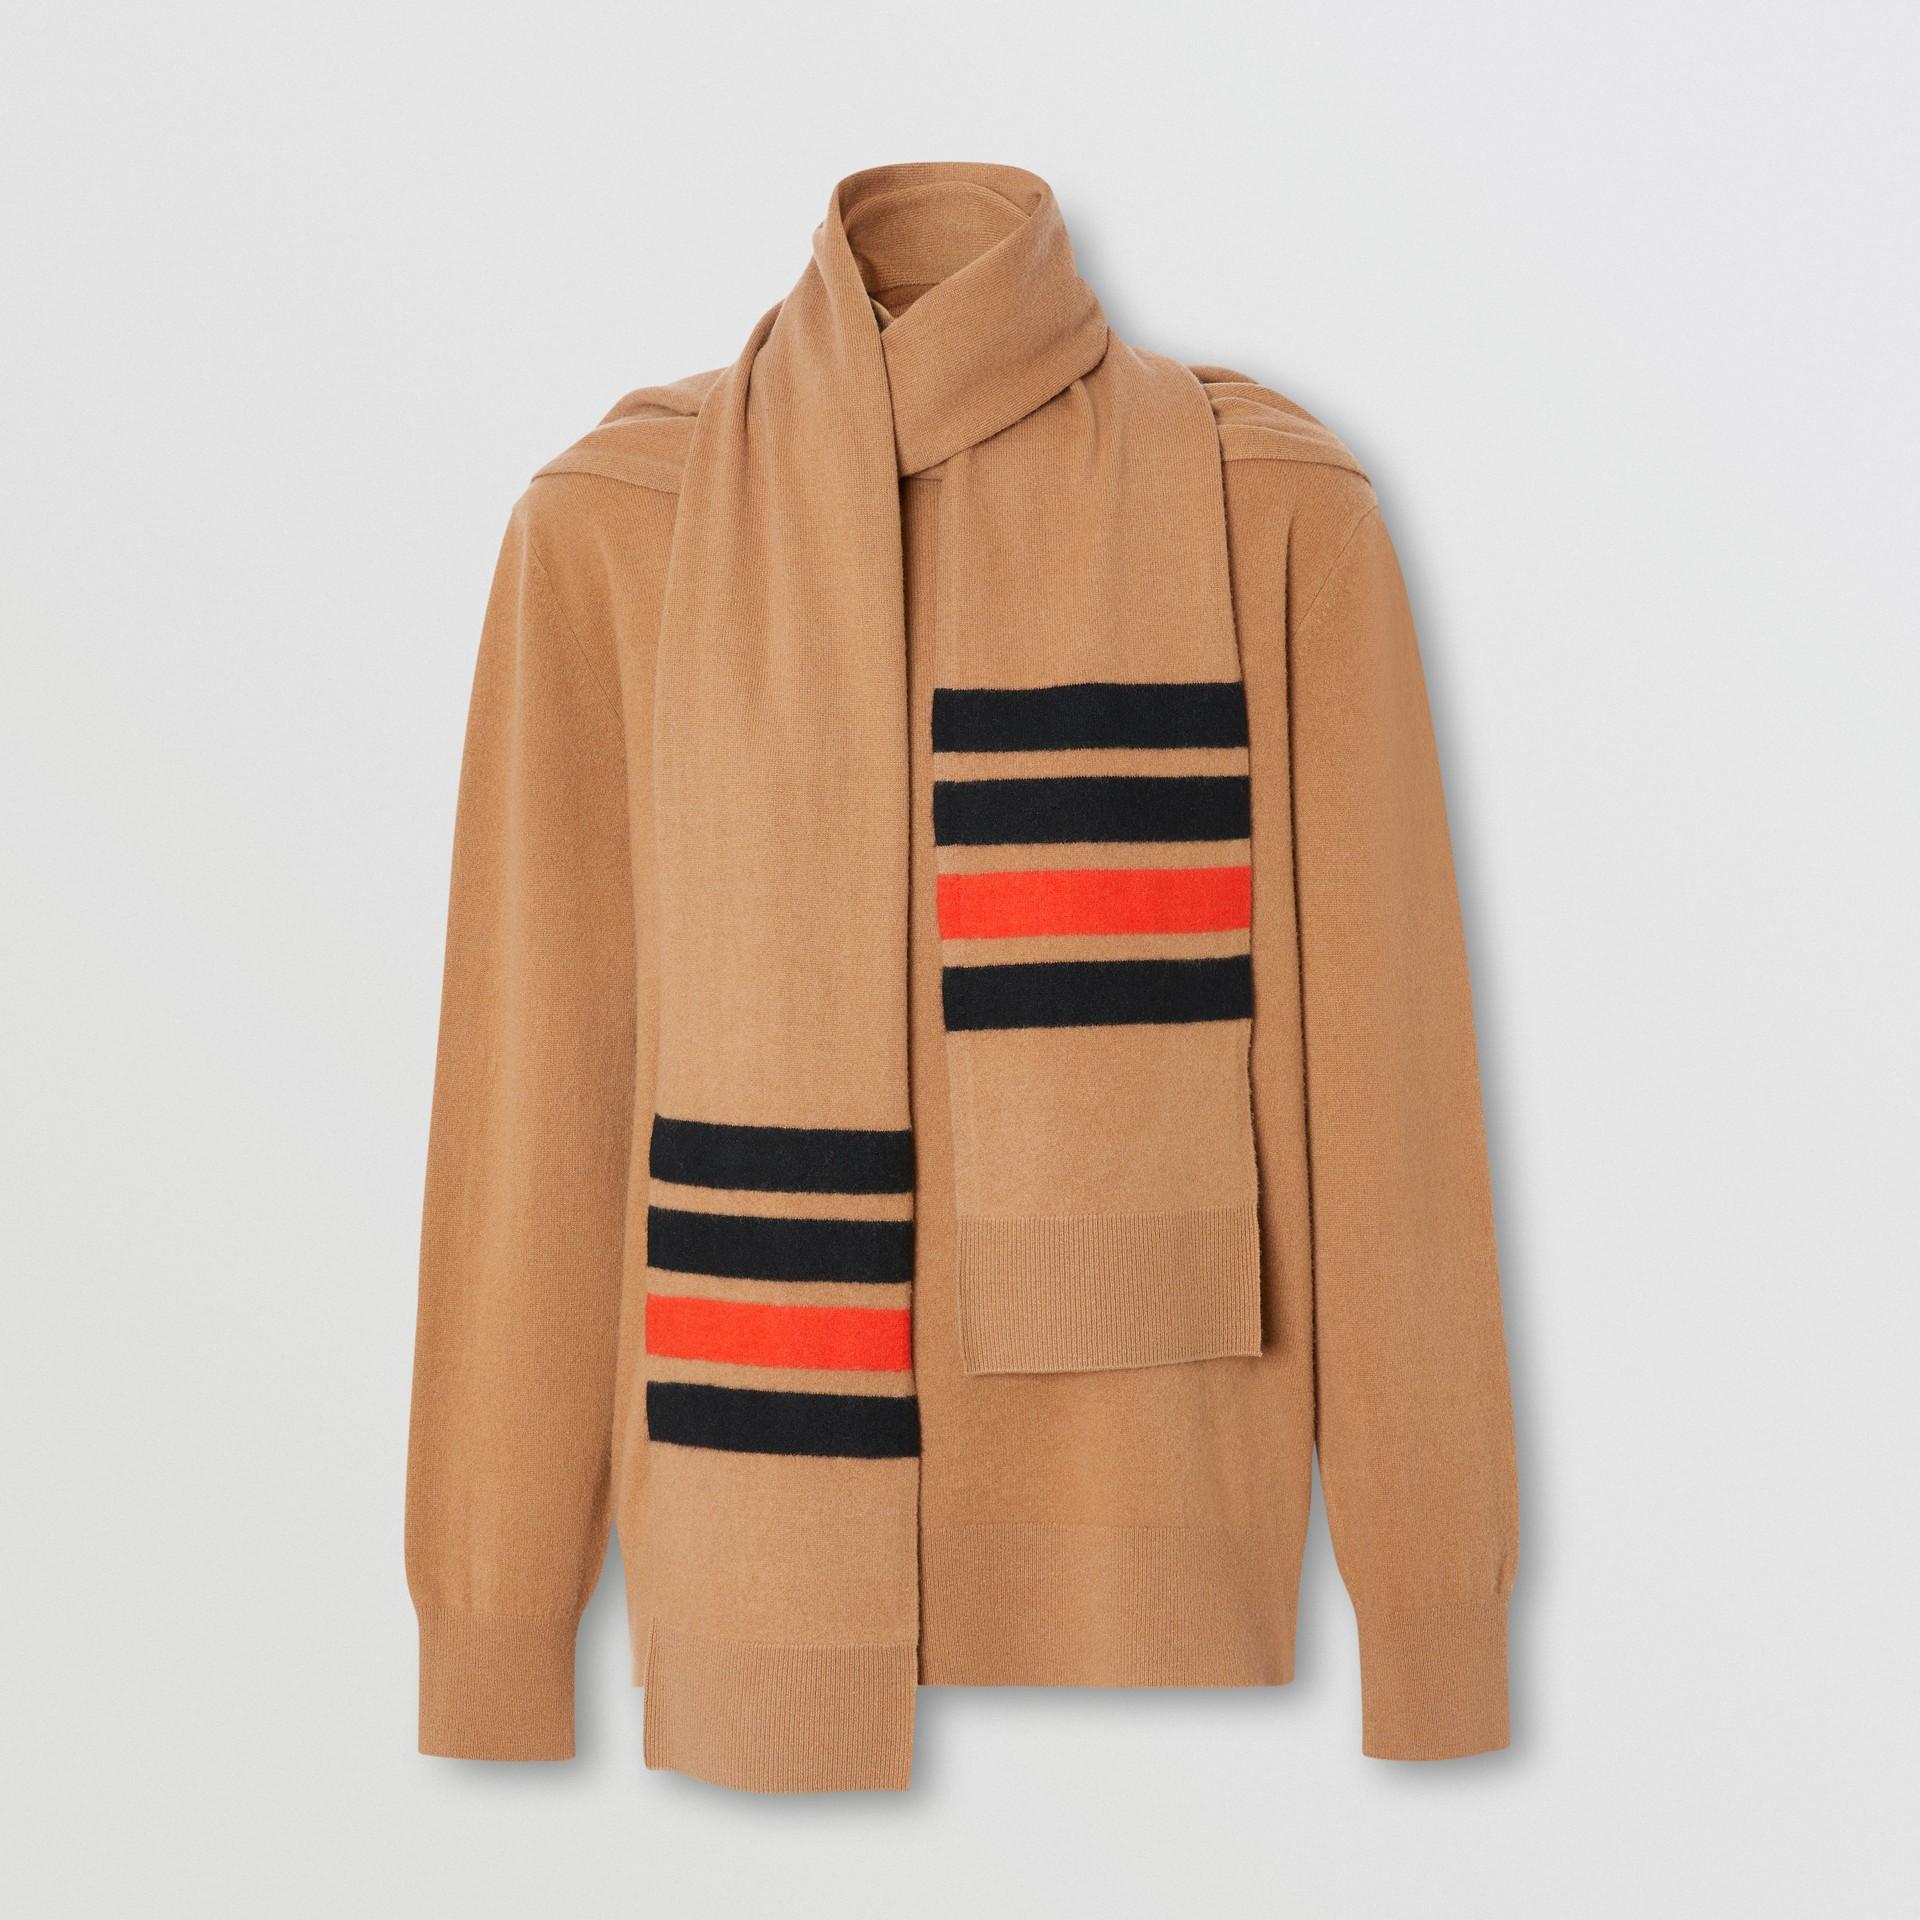 Striped Scarf Detail Merino Wool Cashmere Sweater in Beige - Women | Burberry - gallery image 3